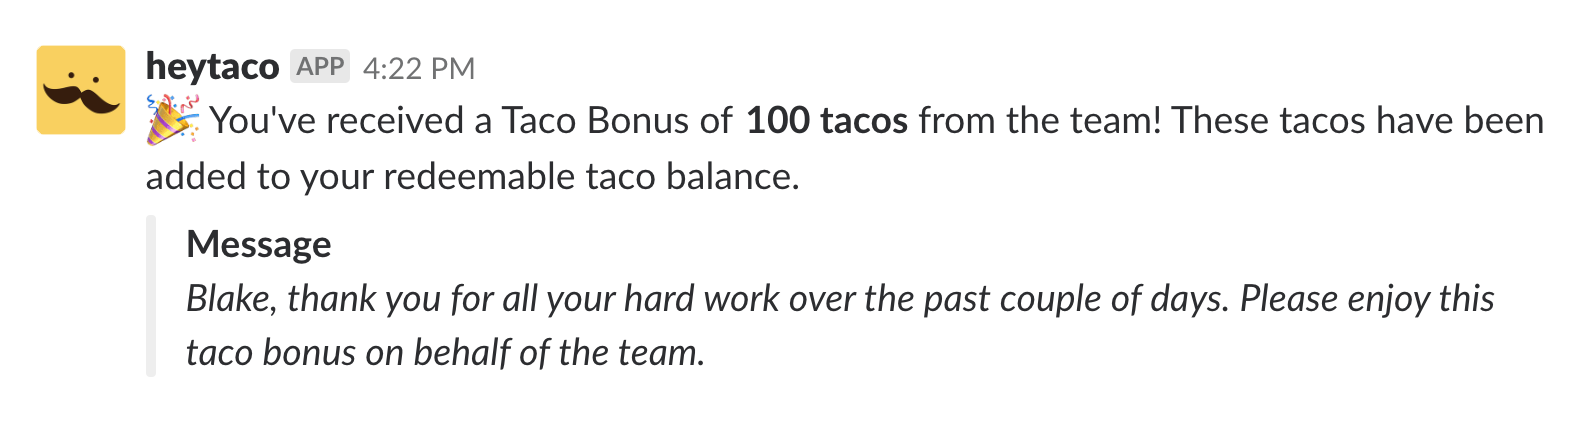 Taco Bonus